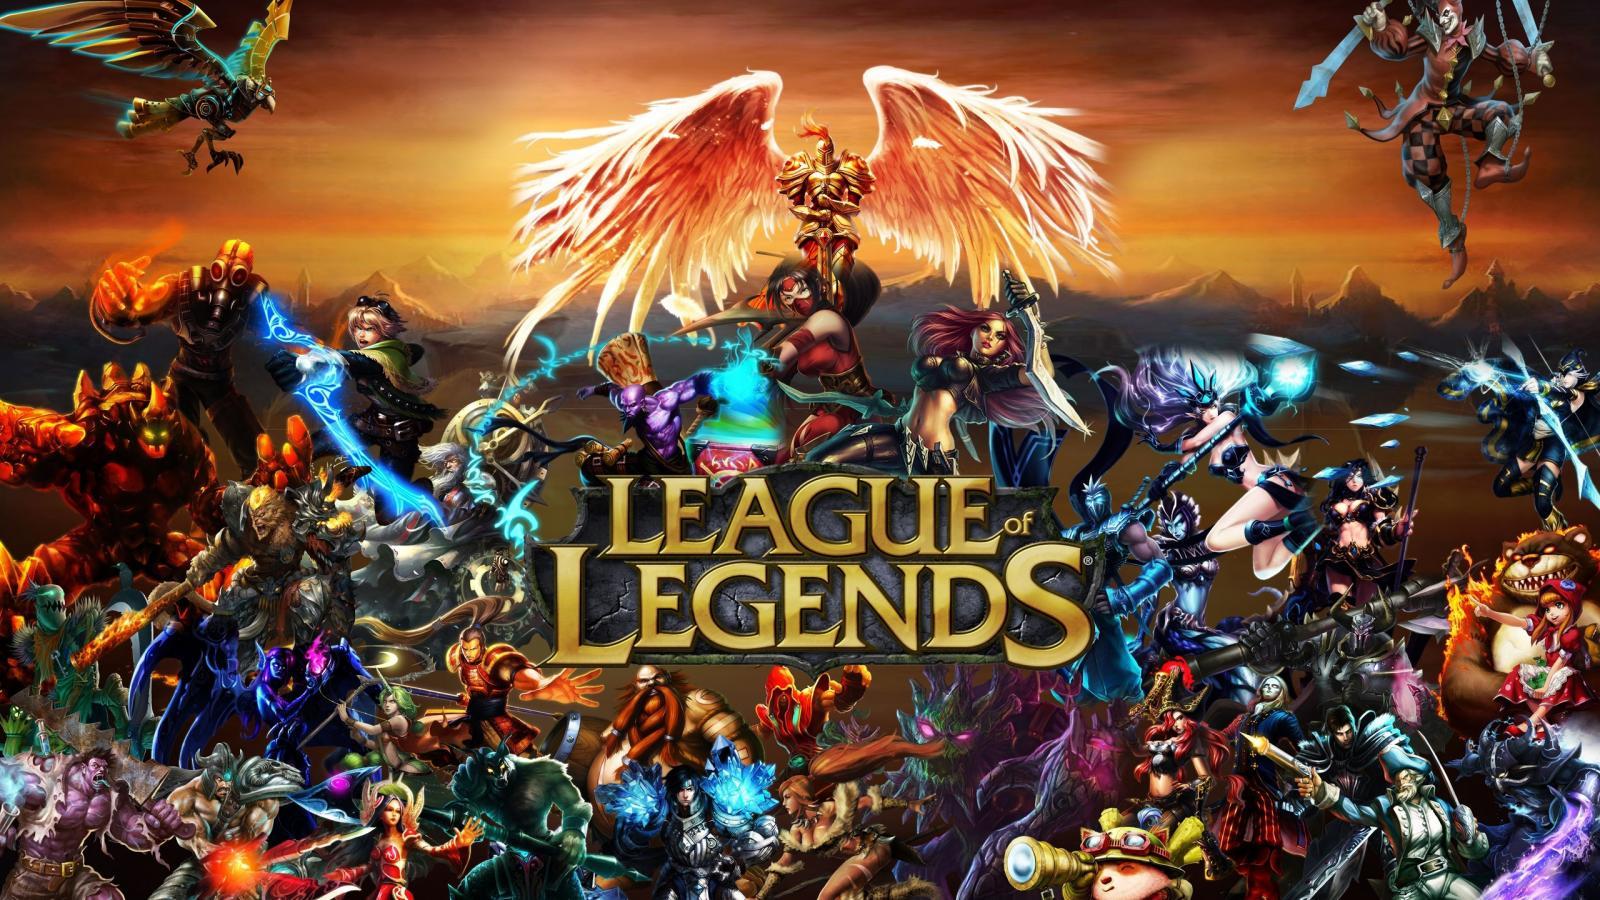 League-of-legends-Champions.jpg